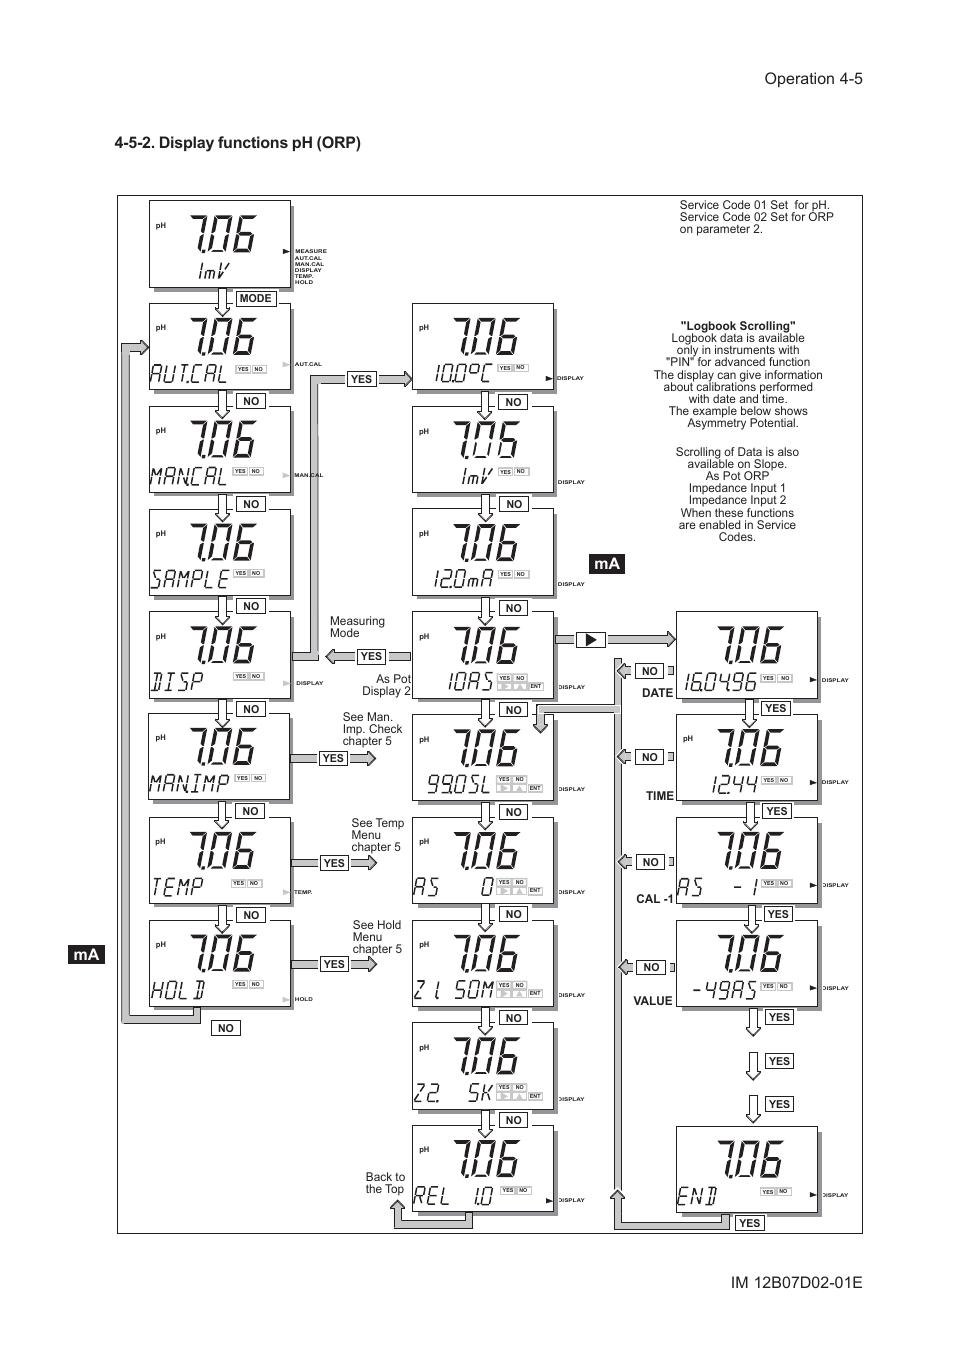 5-2. display functions ph (orp), 5-2. display functions ph